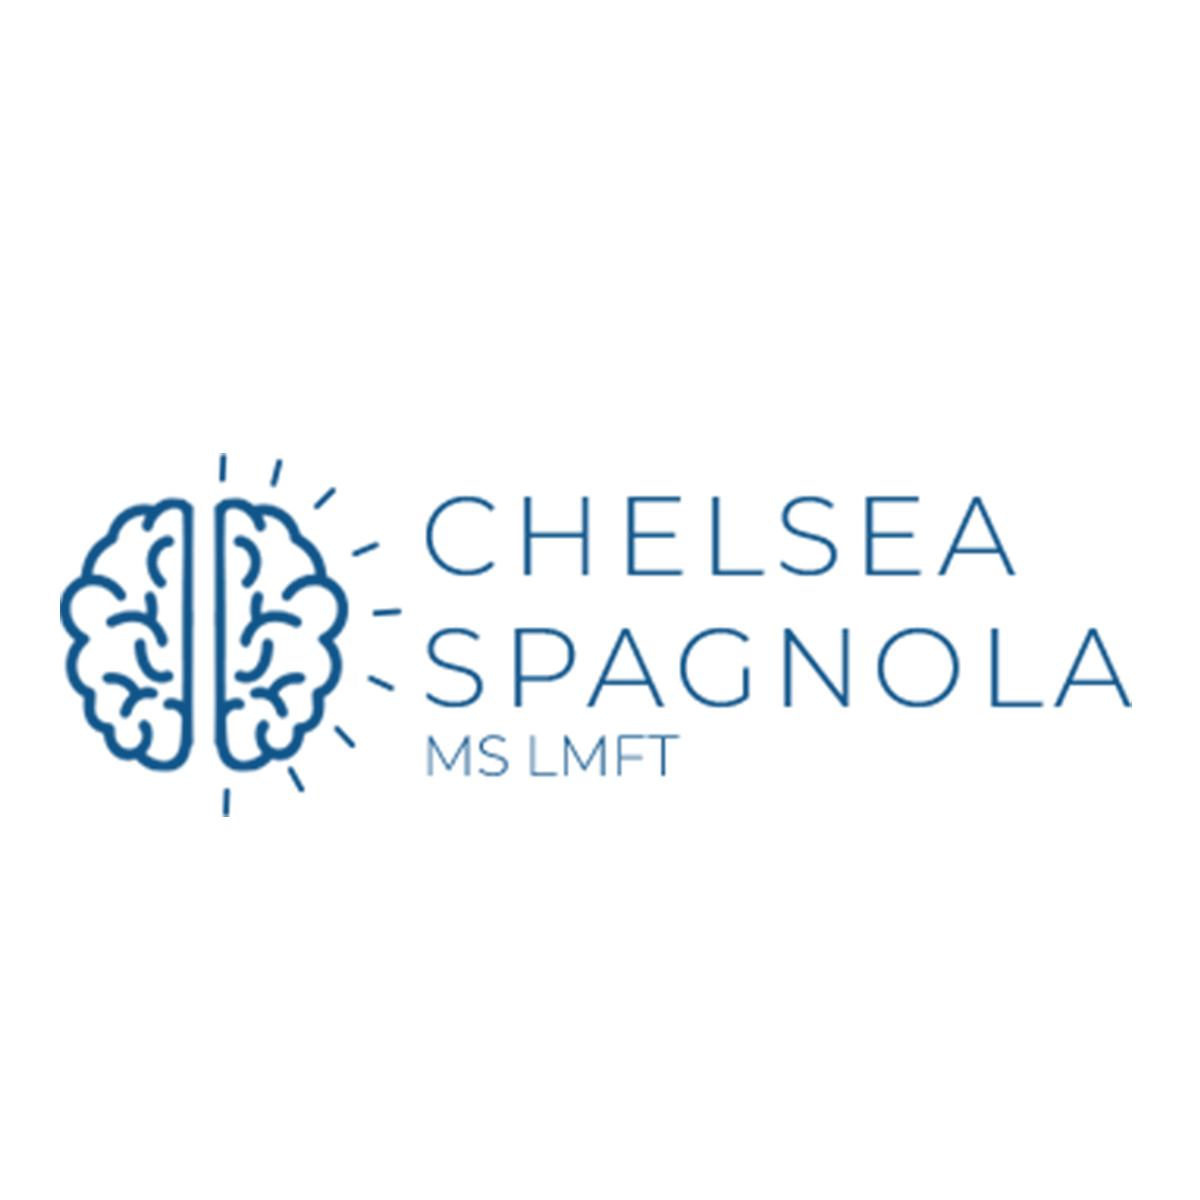 Chelsea Spagnola, MS, LMFT